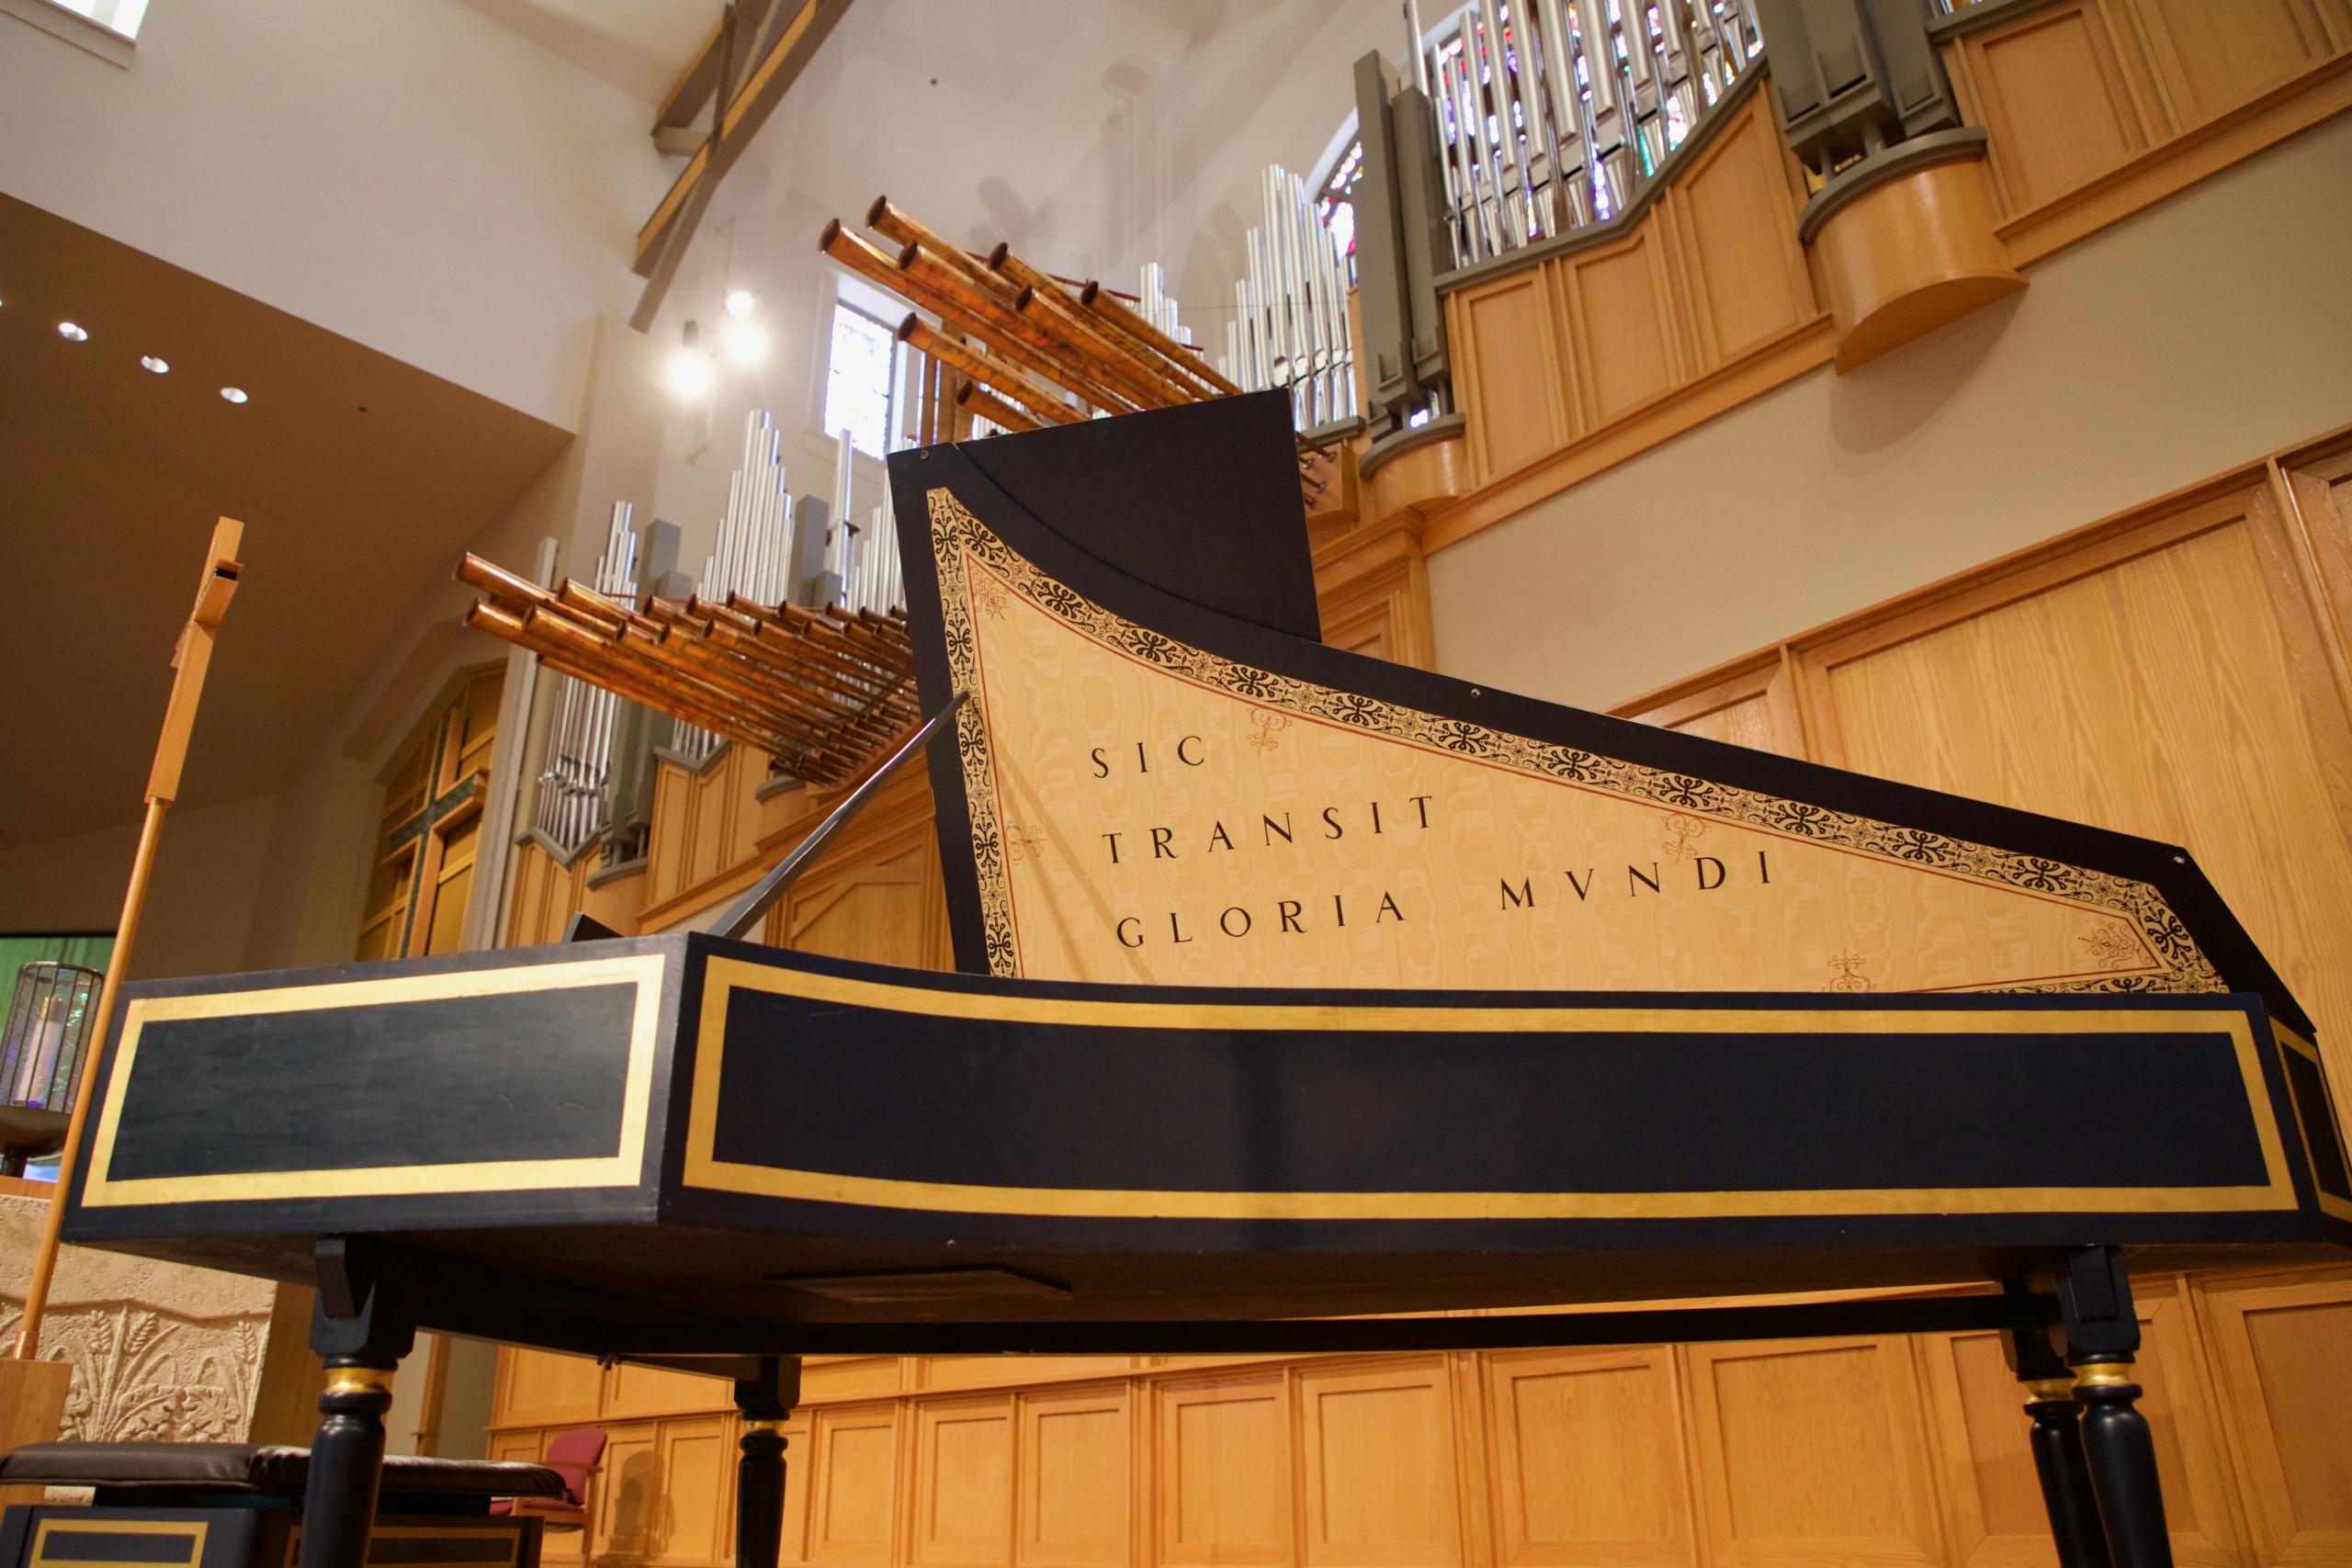 organ and harpsichord - La Casa de Cristo Scottsdale, Arizona Lutheran Church located in Scottsdale, Arizona near Phoenix